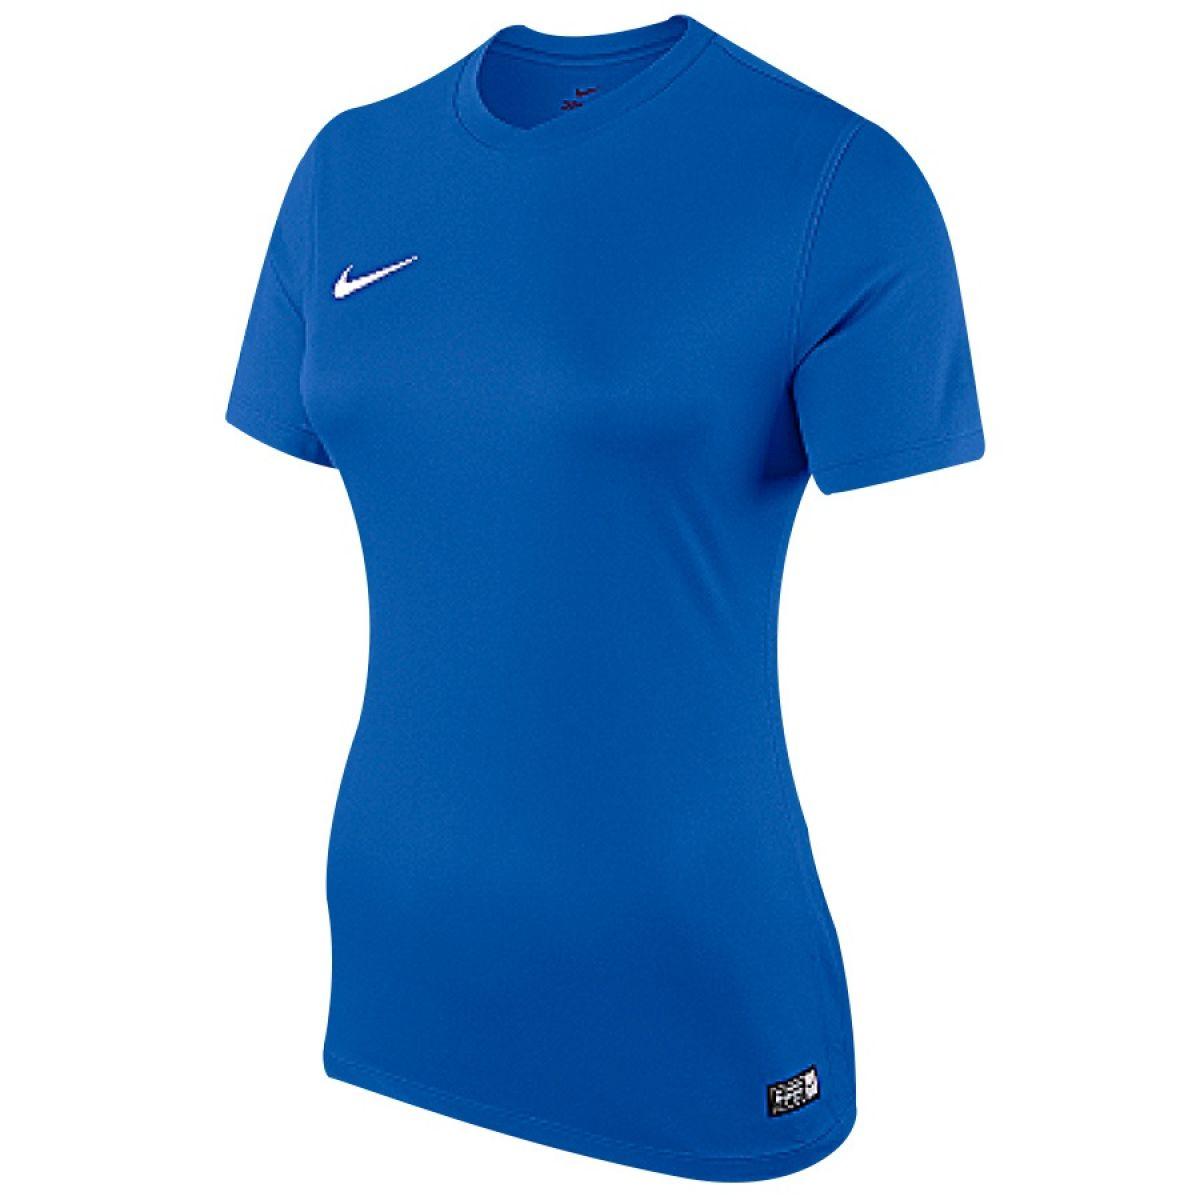 Maillot d\'entraînement Nike Park bleu